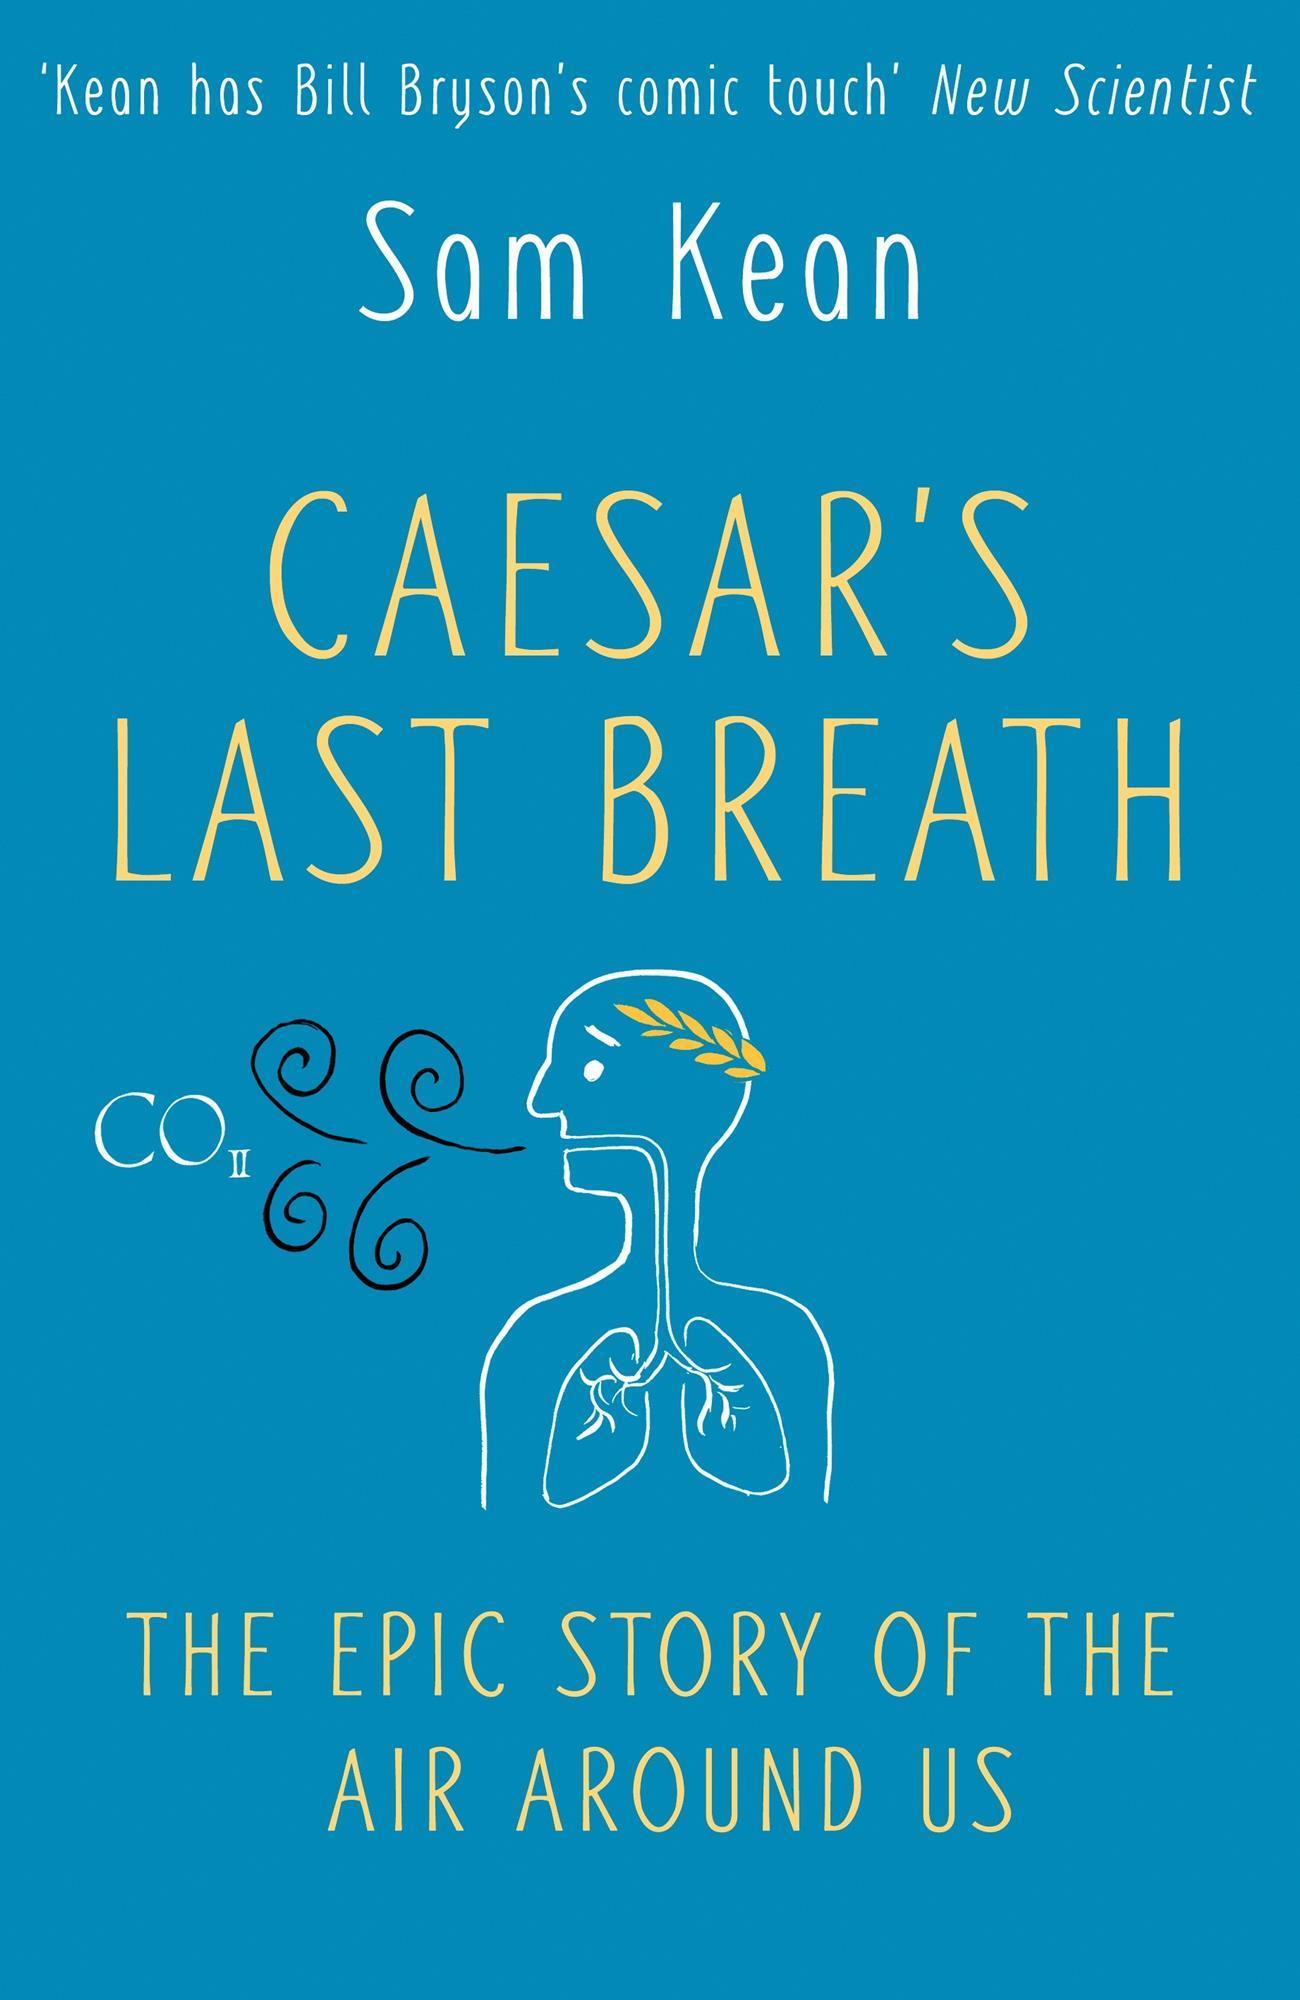 sam-kean-caesars-last-breath.jpg